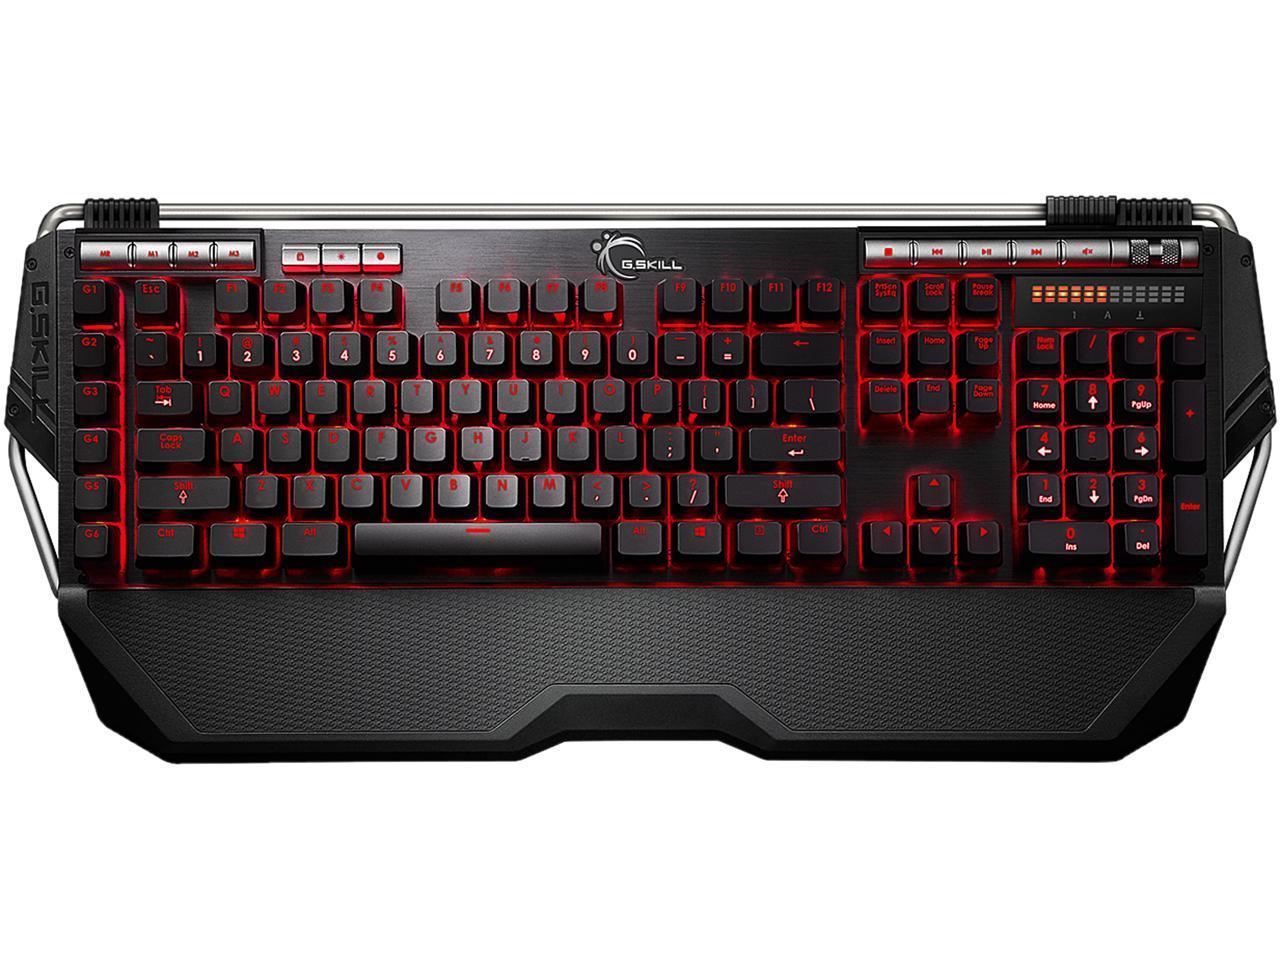 G.SKILL RIPJAWS KM780R MX Mechanical Gaming Keyboard - Cherry MX Red